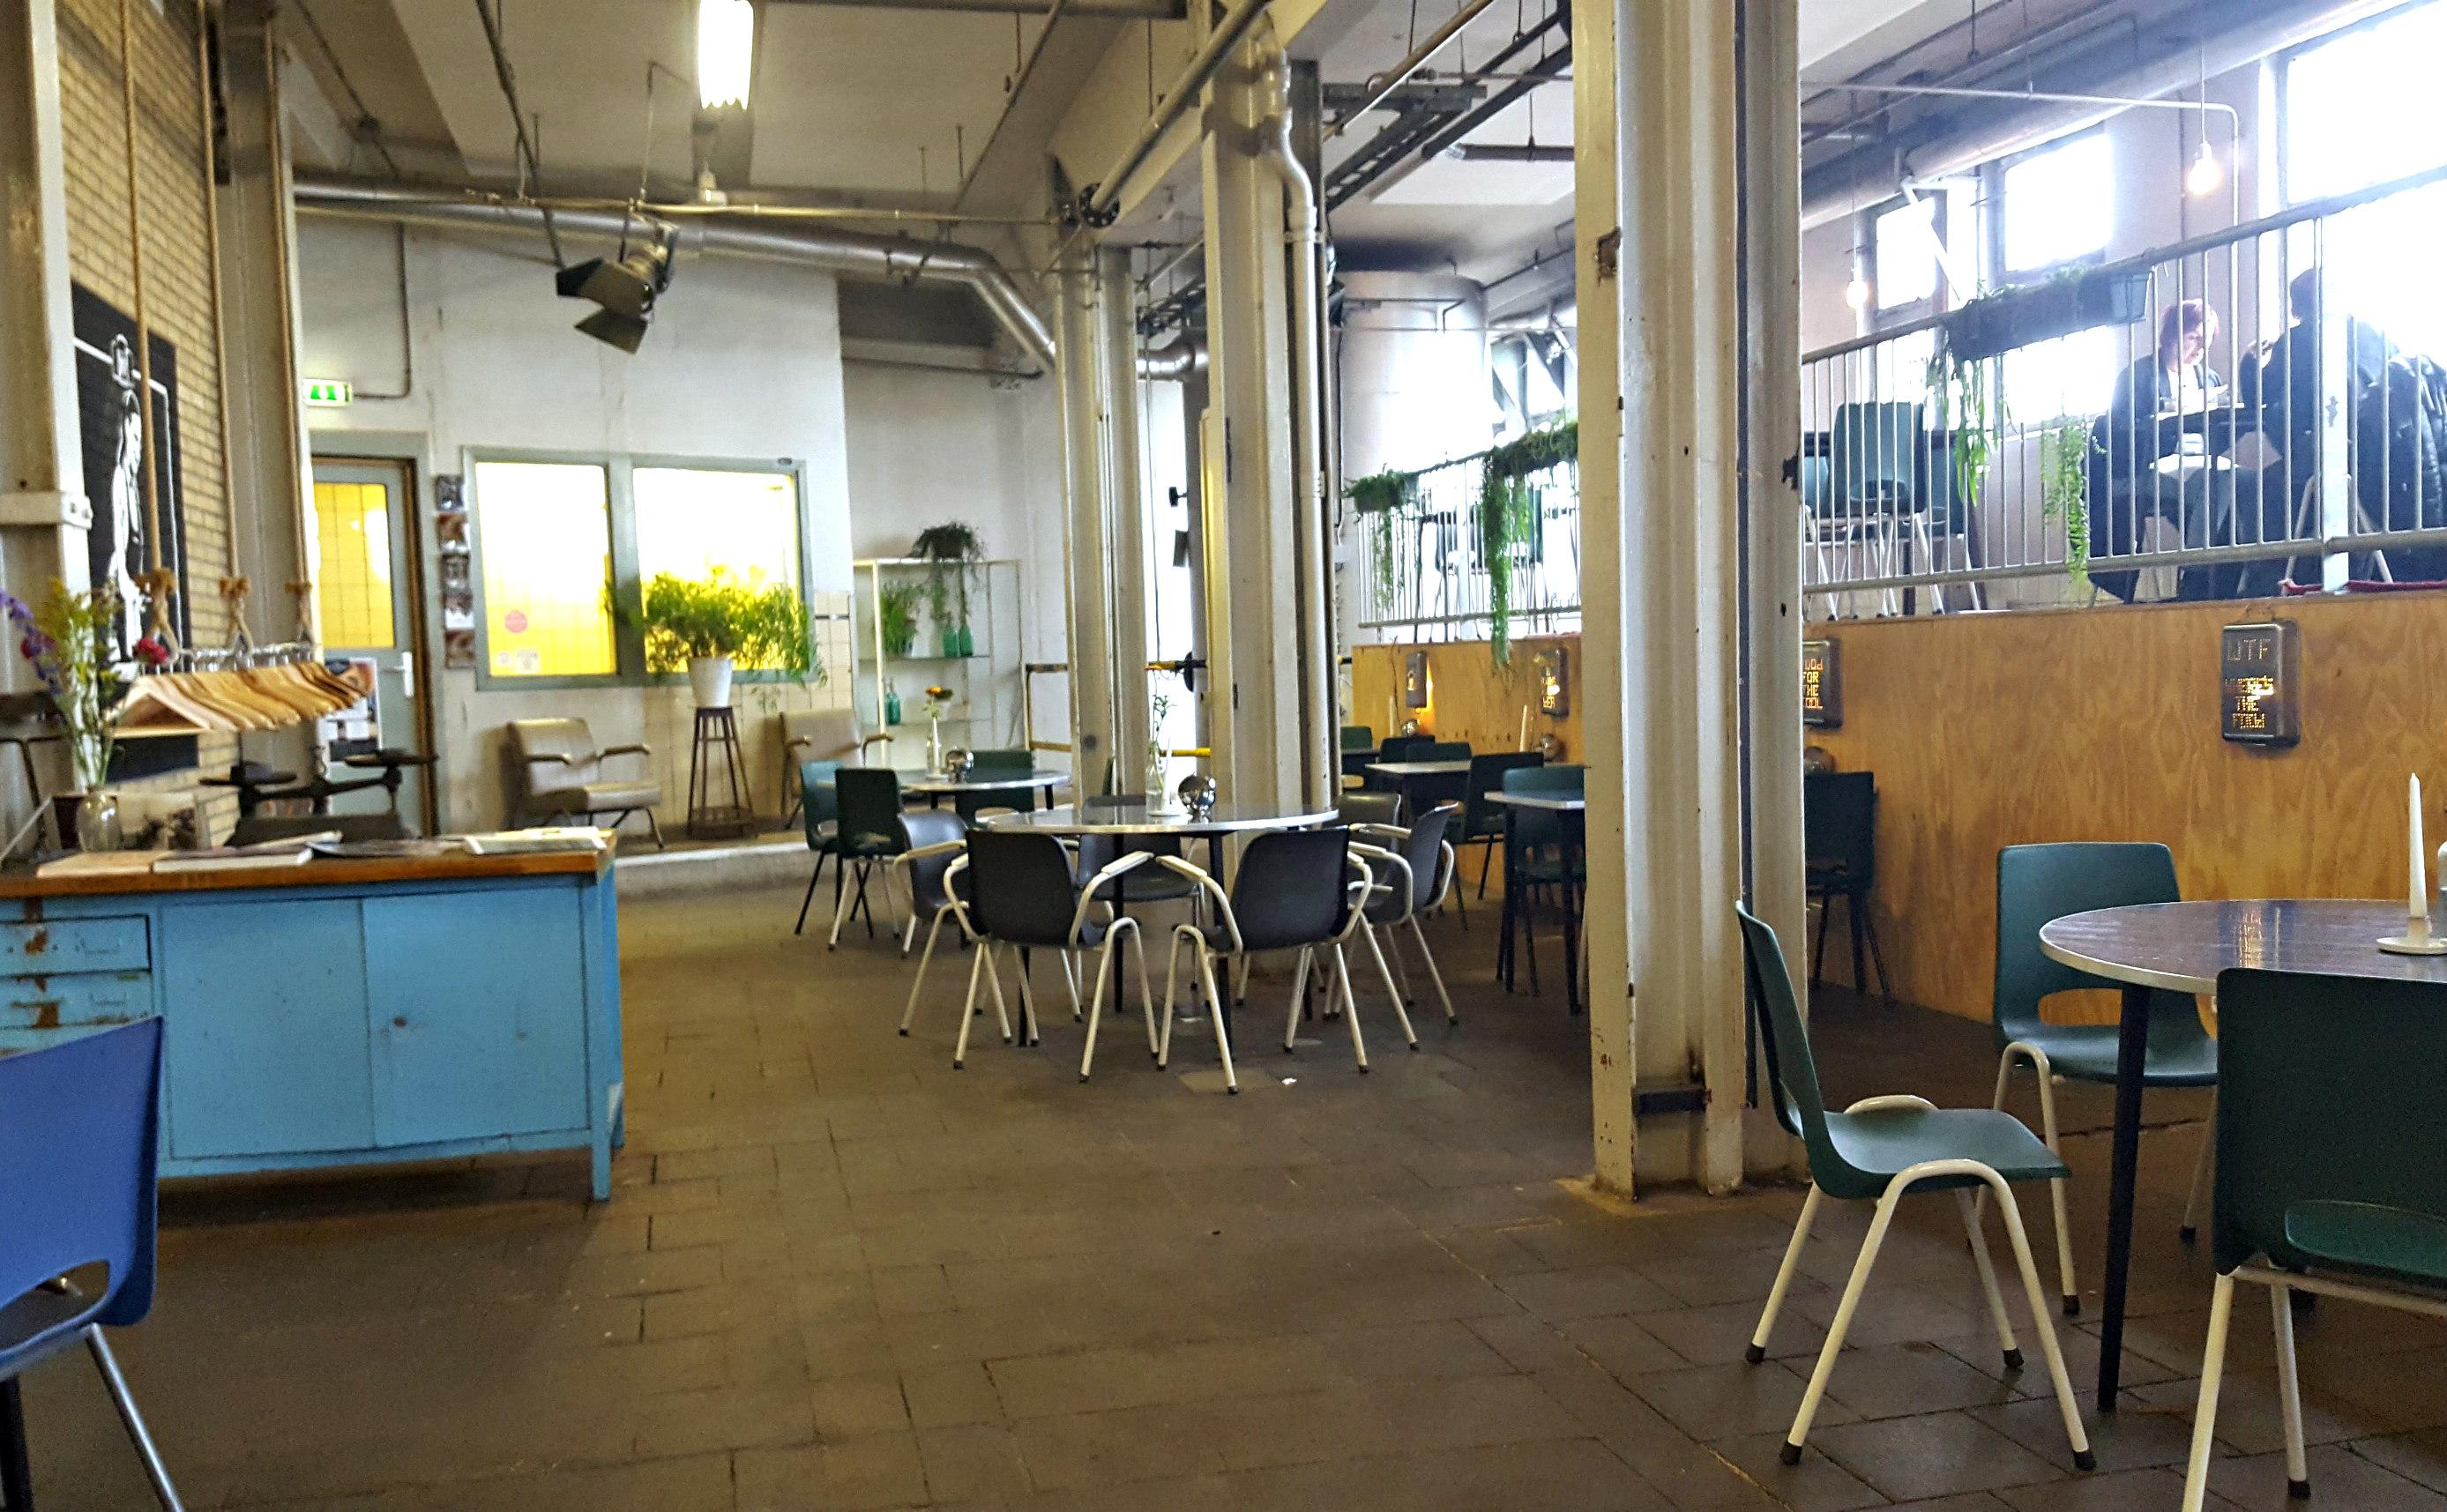 industriele interieur lunchen bij meesterproef hotspot nijmegen ...